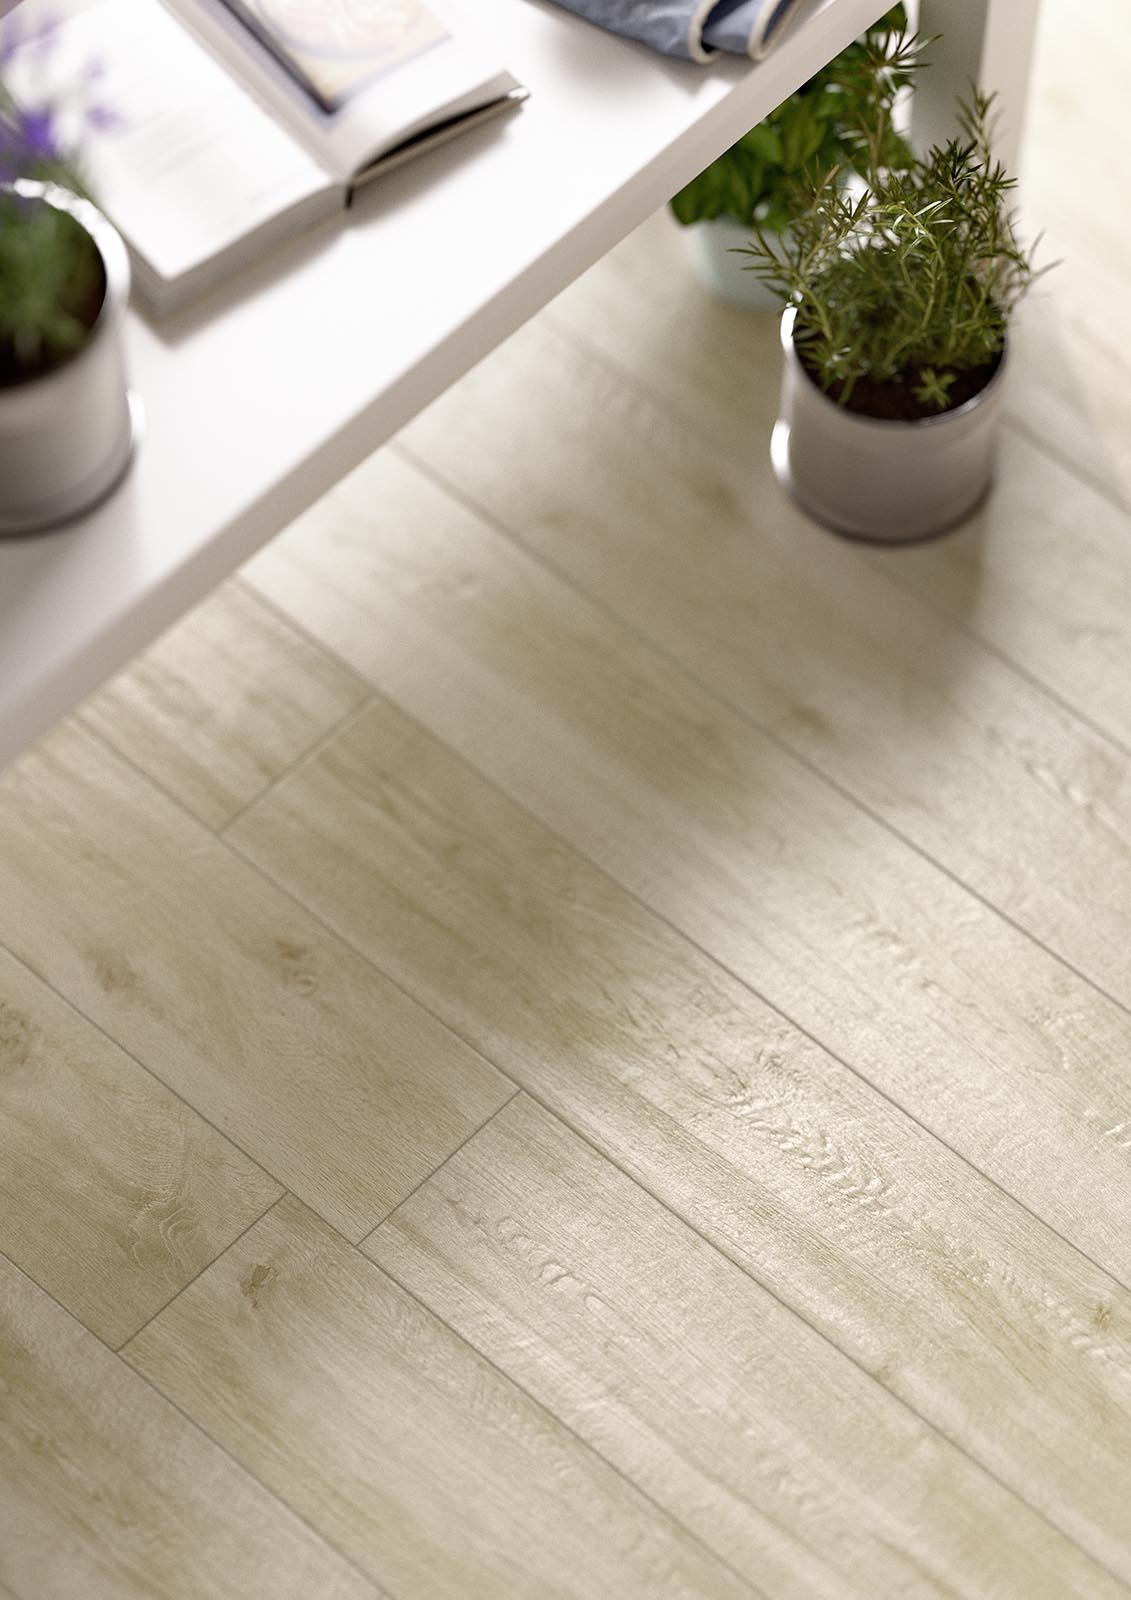 Treverkway pavimento de gres imitaci n madera marazzi - Plaqueta imitacion madera ...